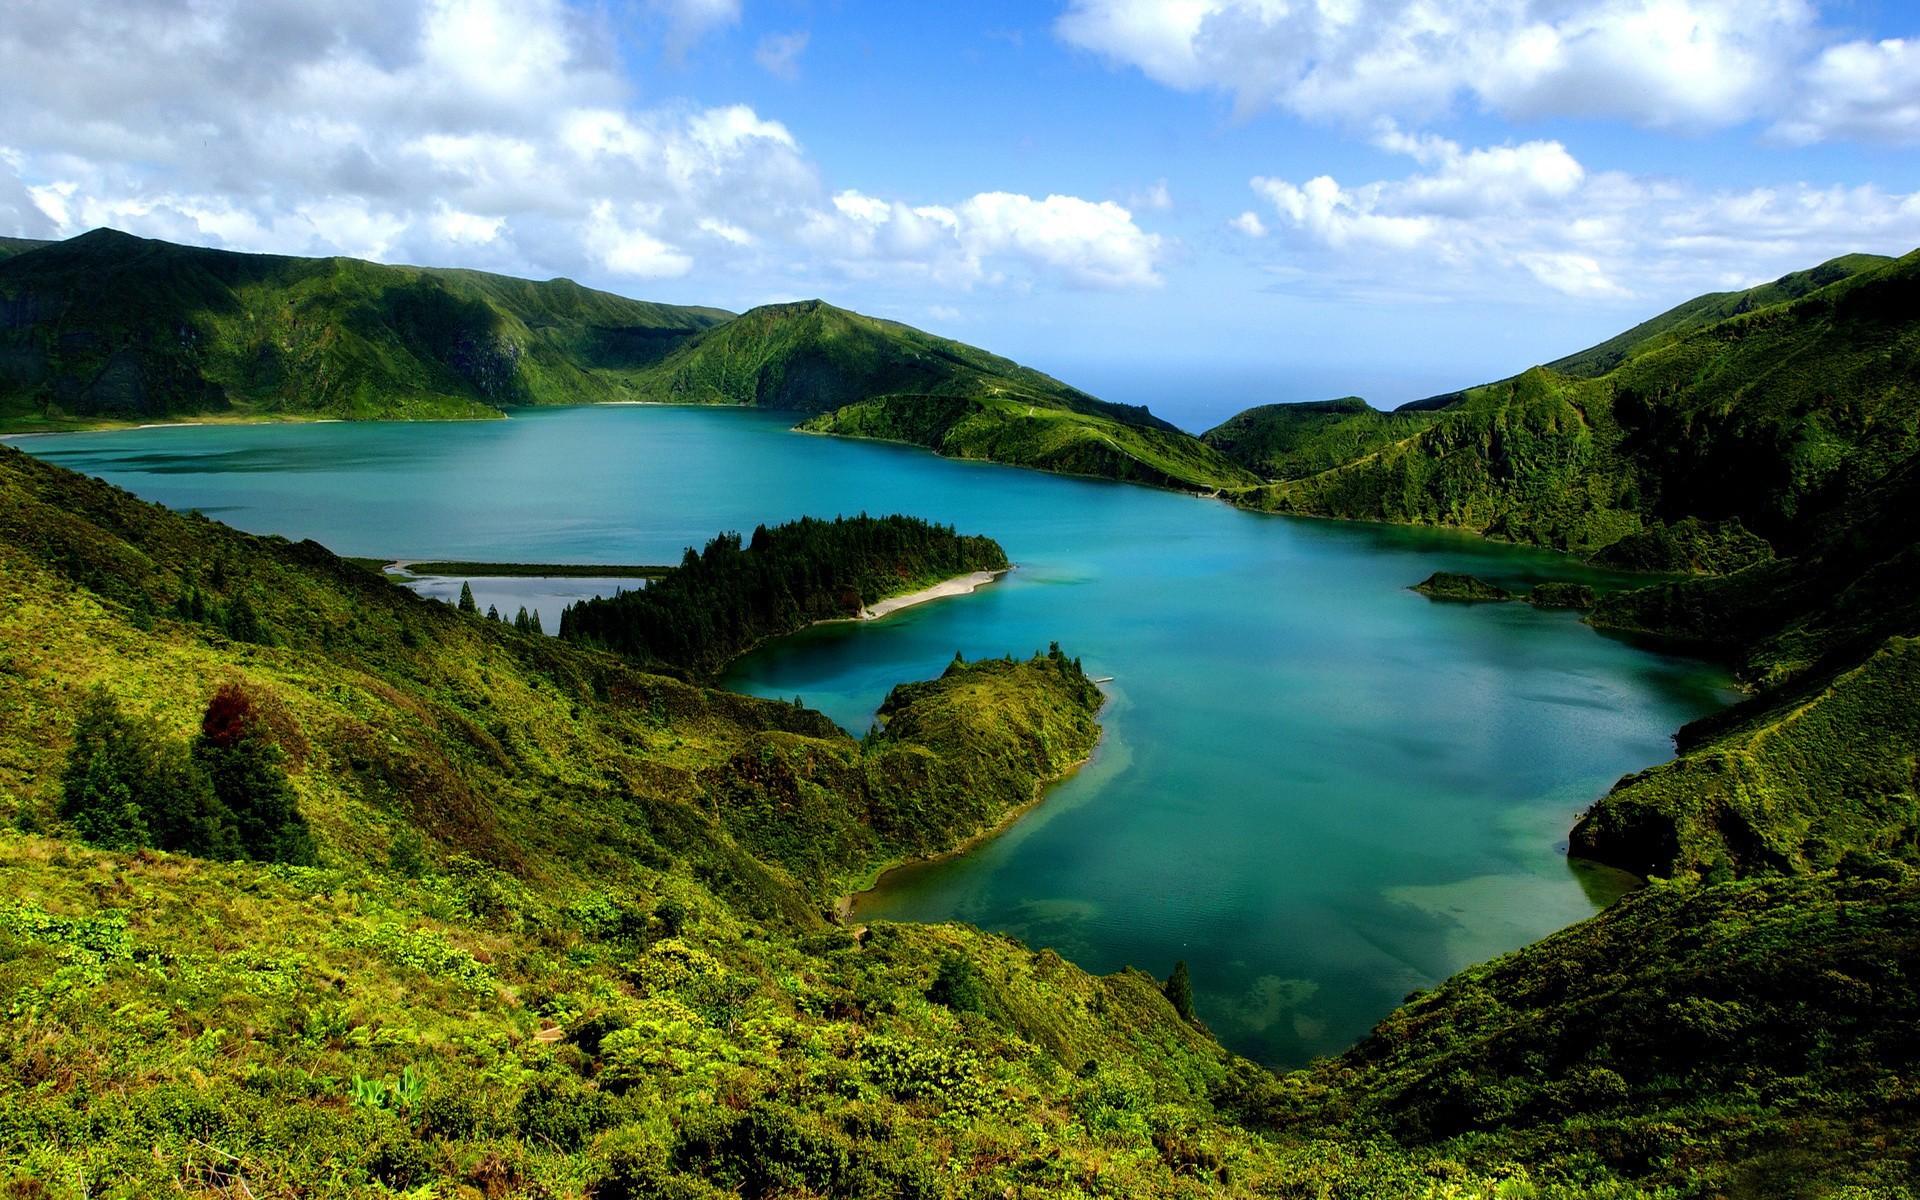 Download sao miguel island azores hd wallpaperjpg 1920x1200